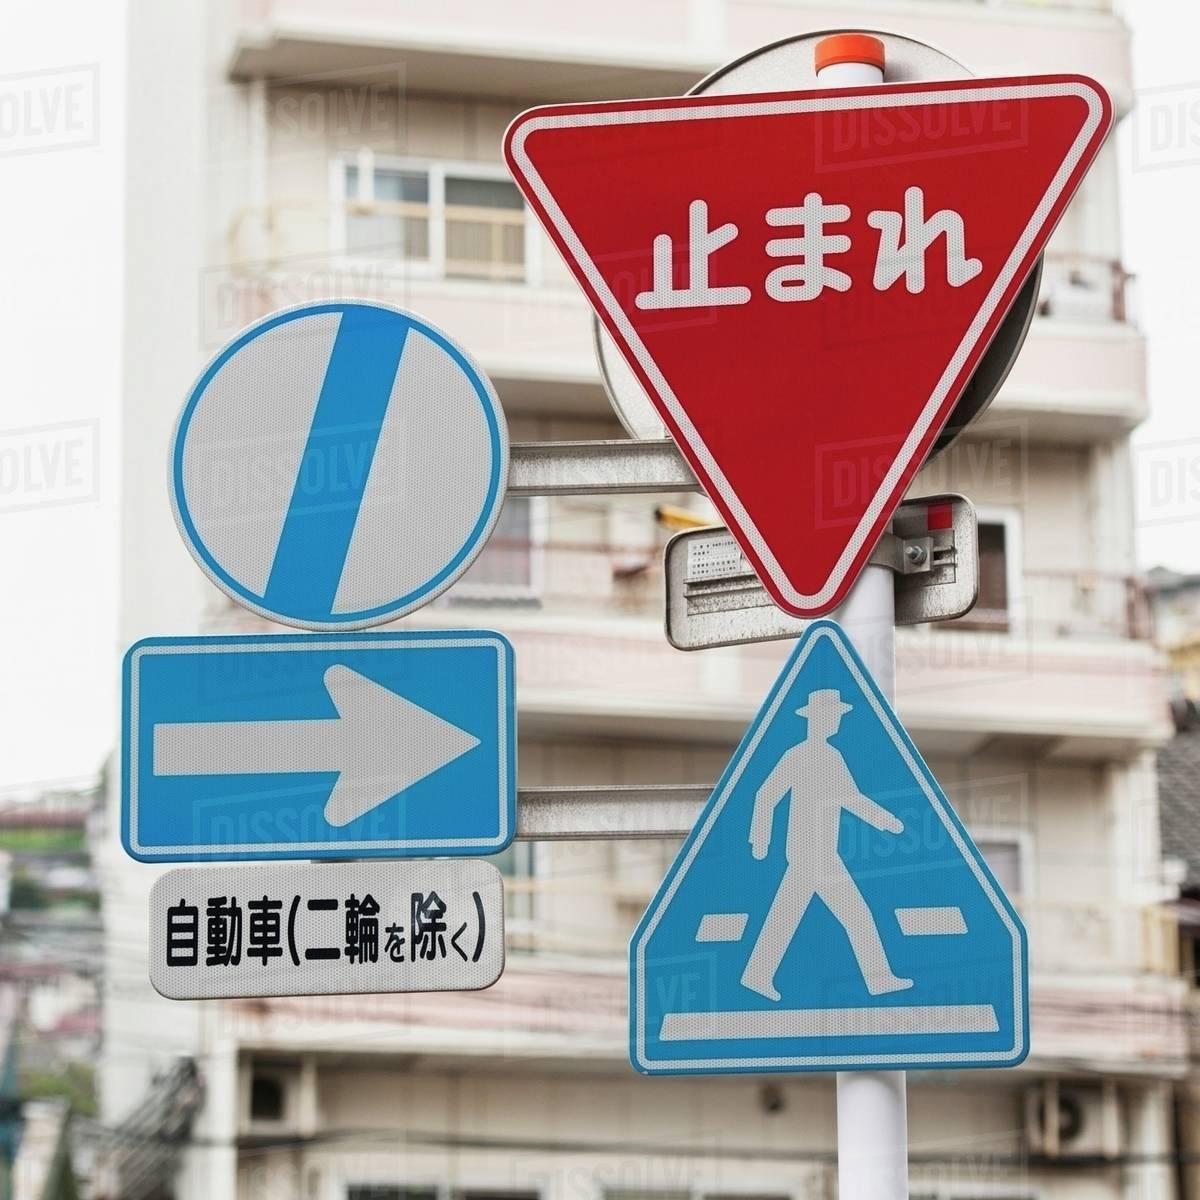 Street Signs Nagasaki Japan Stock Photo Dissolve